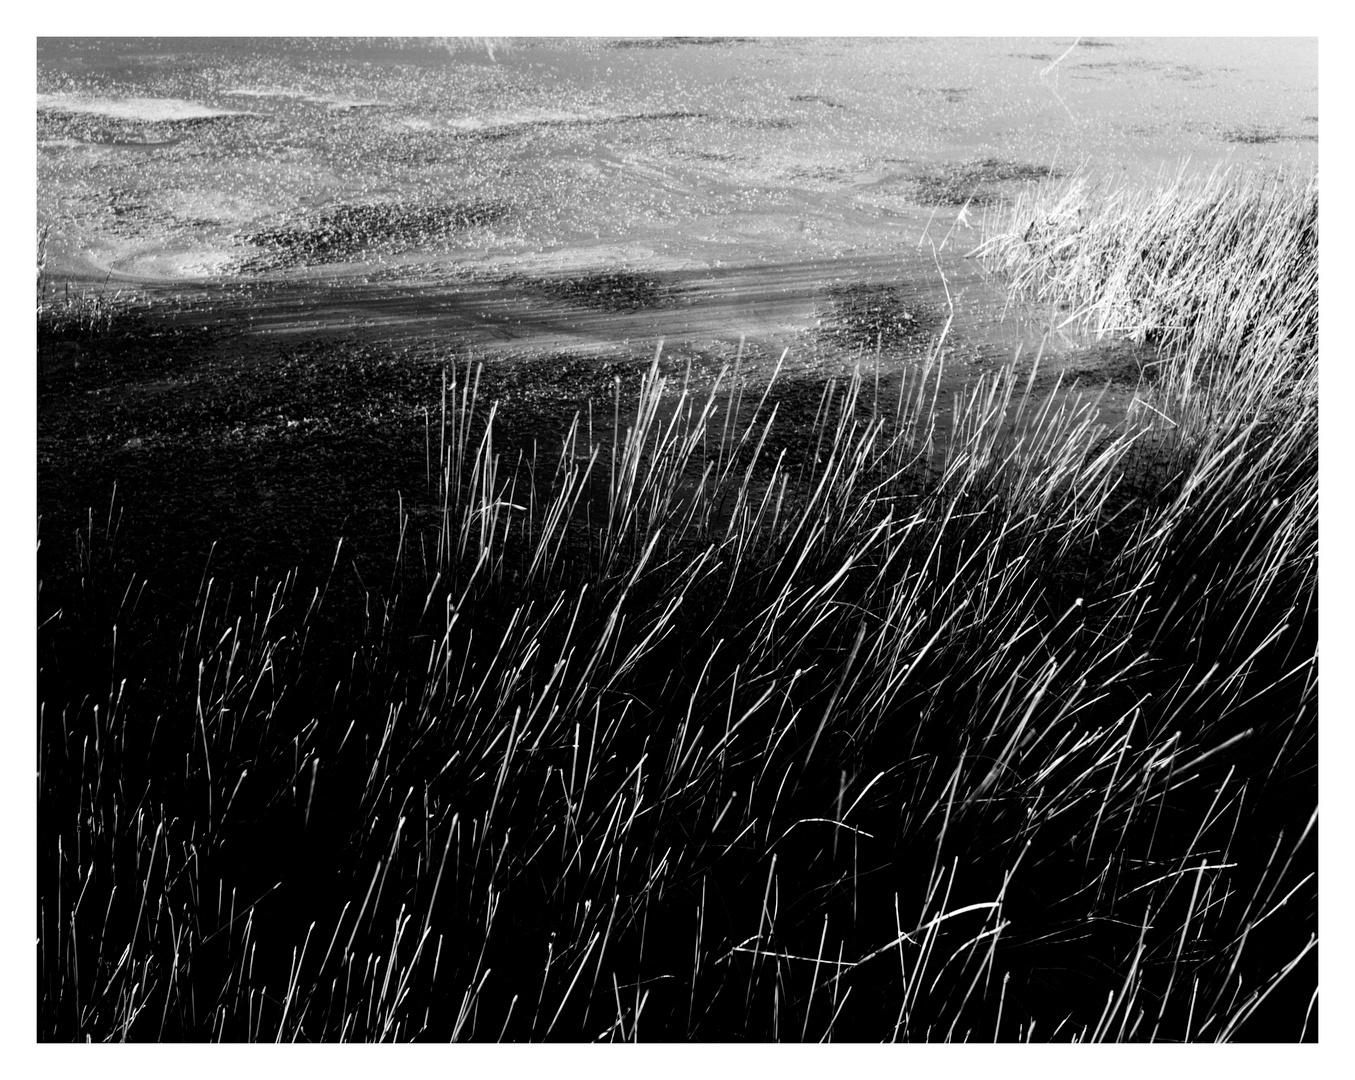 Reeds and Mary, Flagstaff, Arizona, 2011.jpg